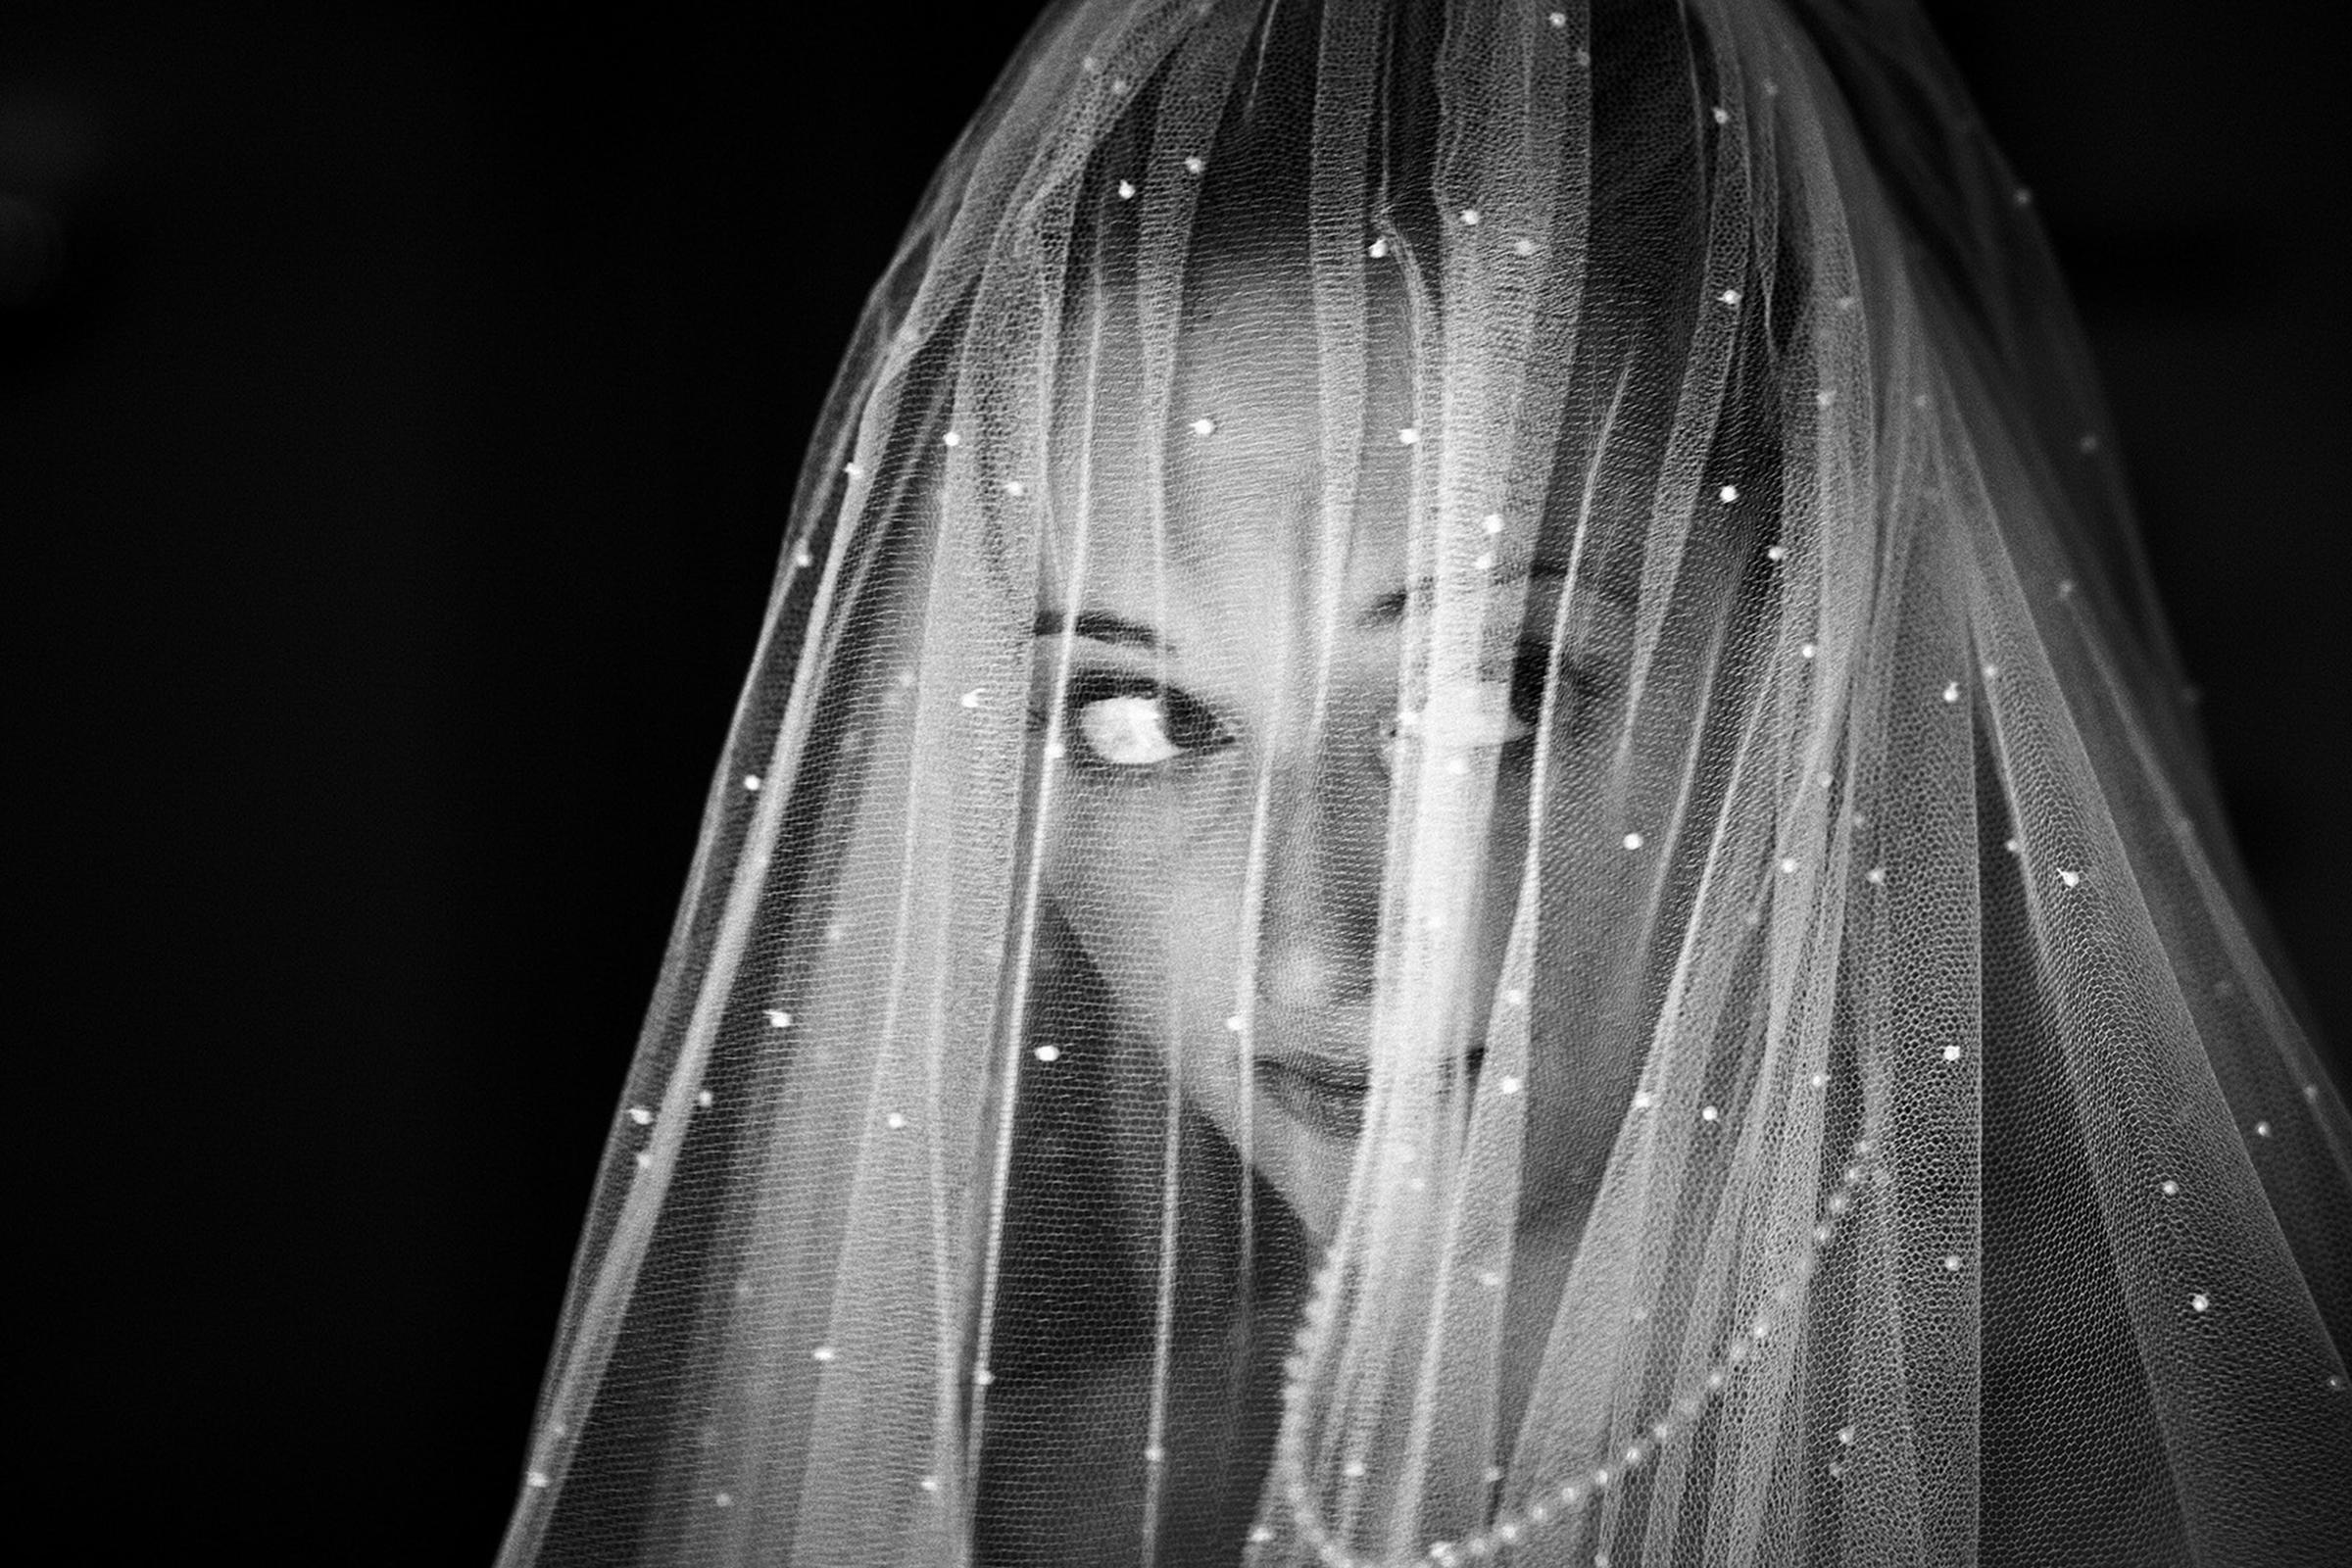 Bride under sparkling  veil - photo by Jeff Ascough